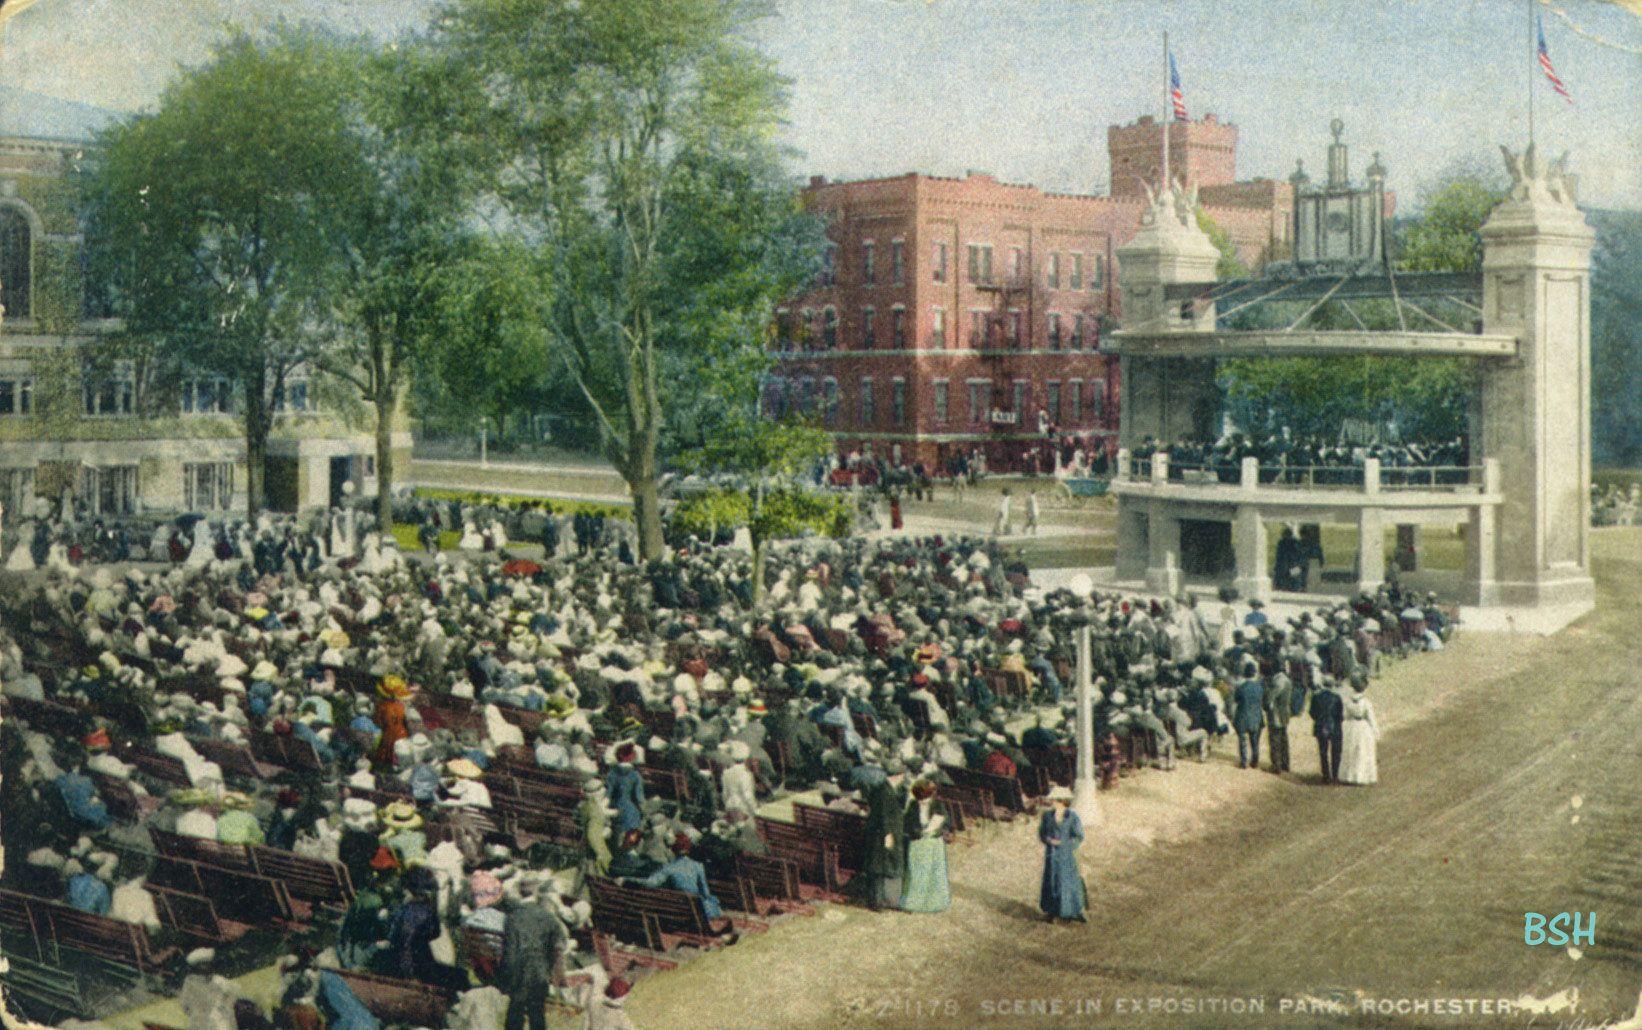 Exposition Park, now Edgerton Park, Rochester, New York